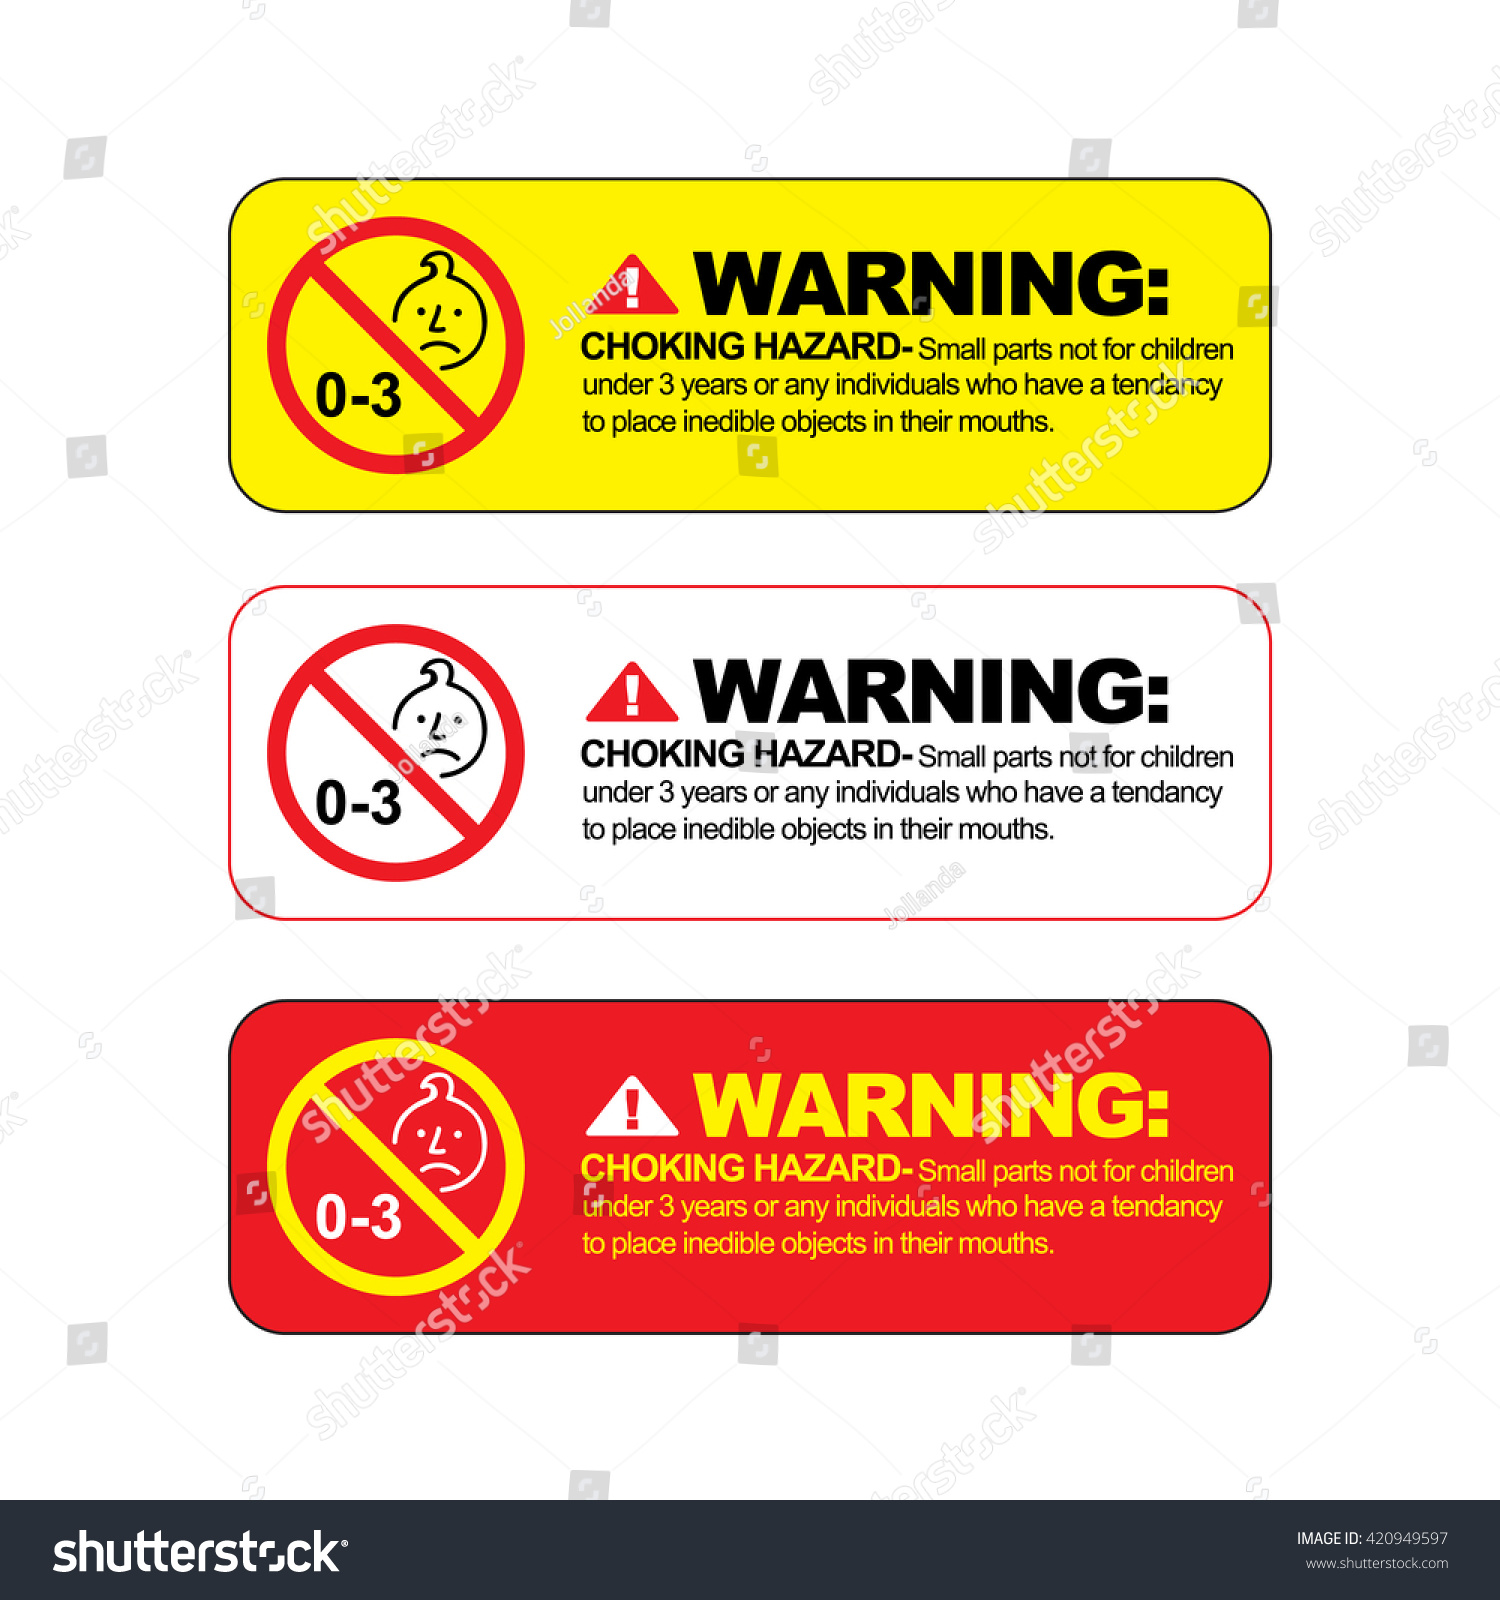 Choking Hazard Warning Vector Sign Warning Stock Vector